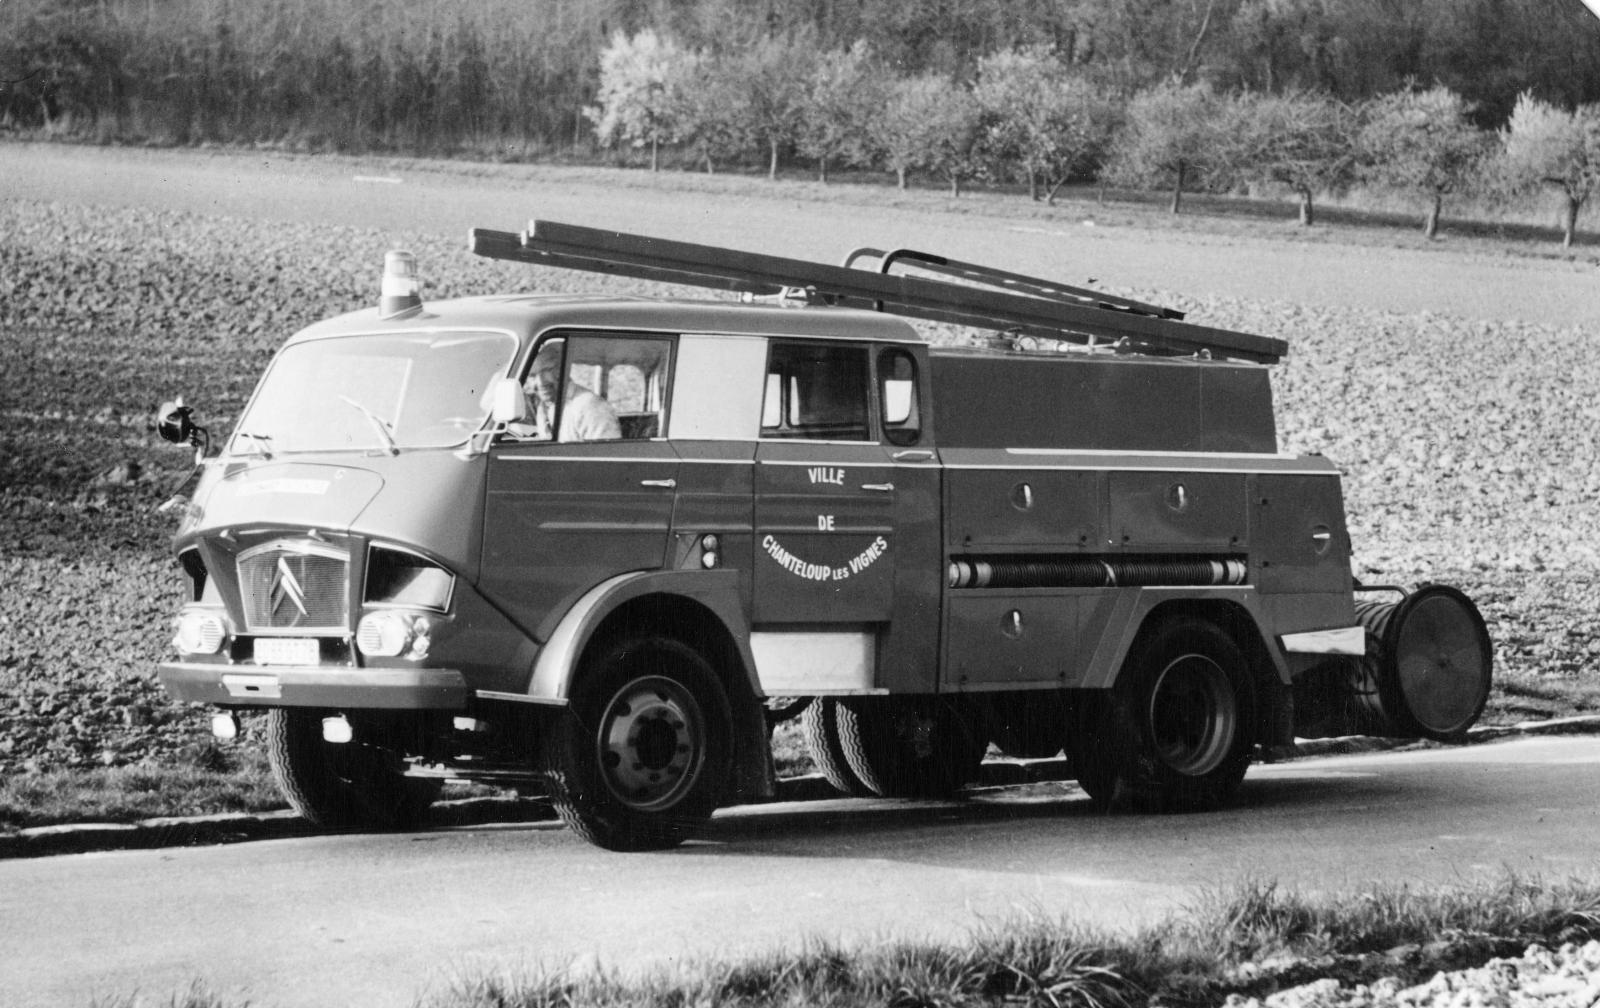 Грузовик типа 350. 1967 г.